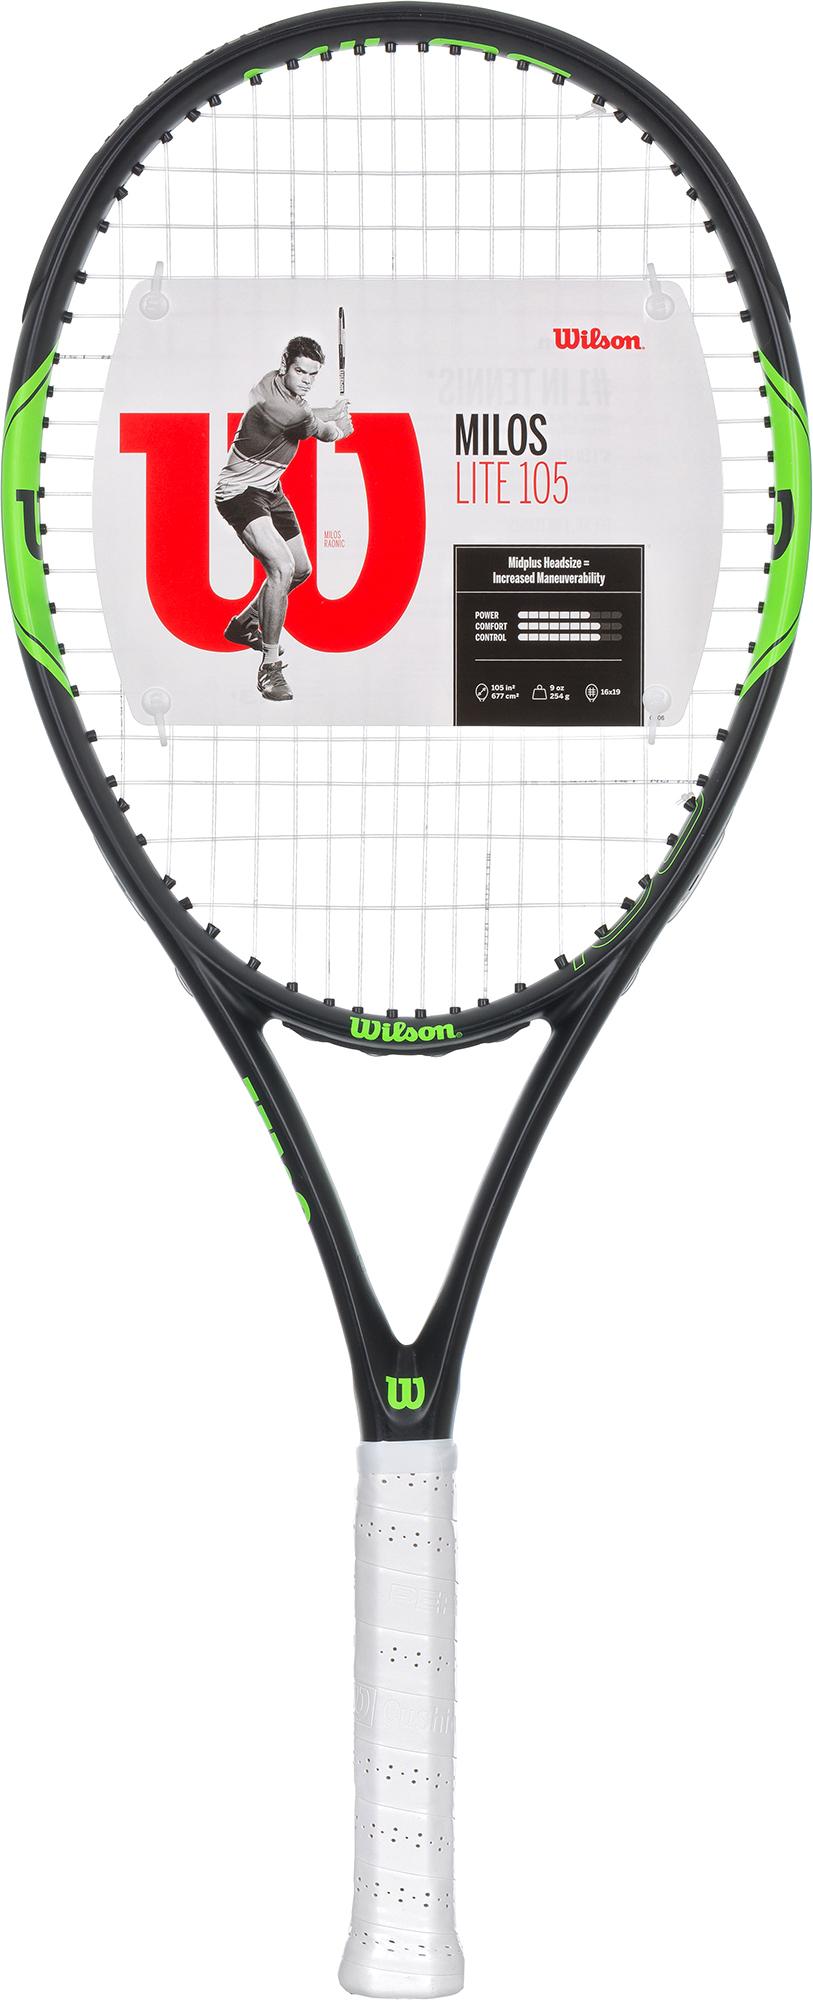 Wilson Ракетка для большого тенниса Wilson Milos Lite 105, размер 3 wilson набор мячей для большого тенниса wilson australian open 3 ball can размер без размера